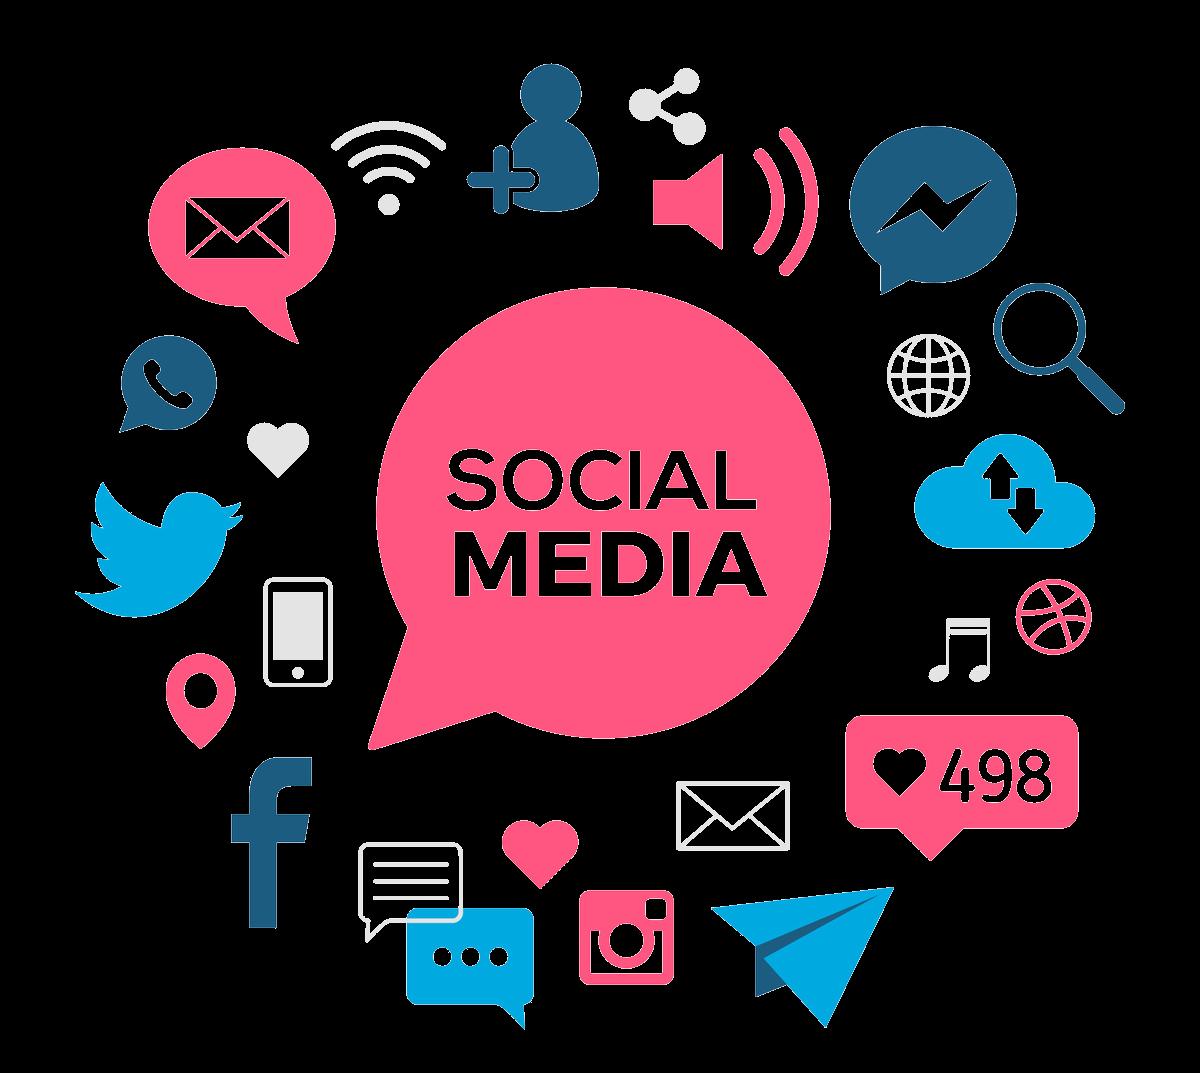 Social Media Marketing Agency in Udaipur